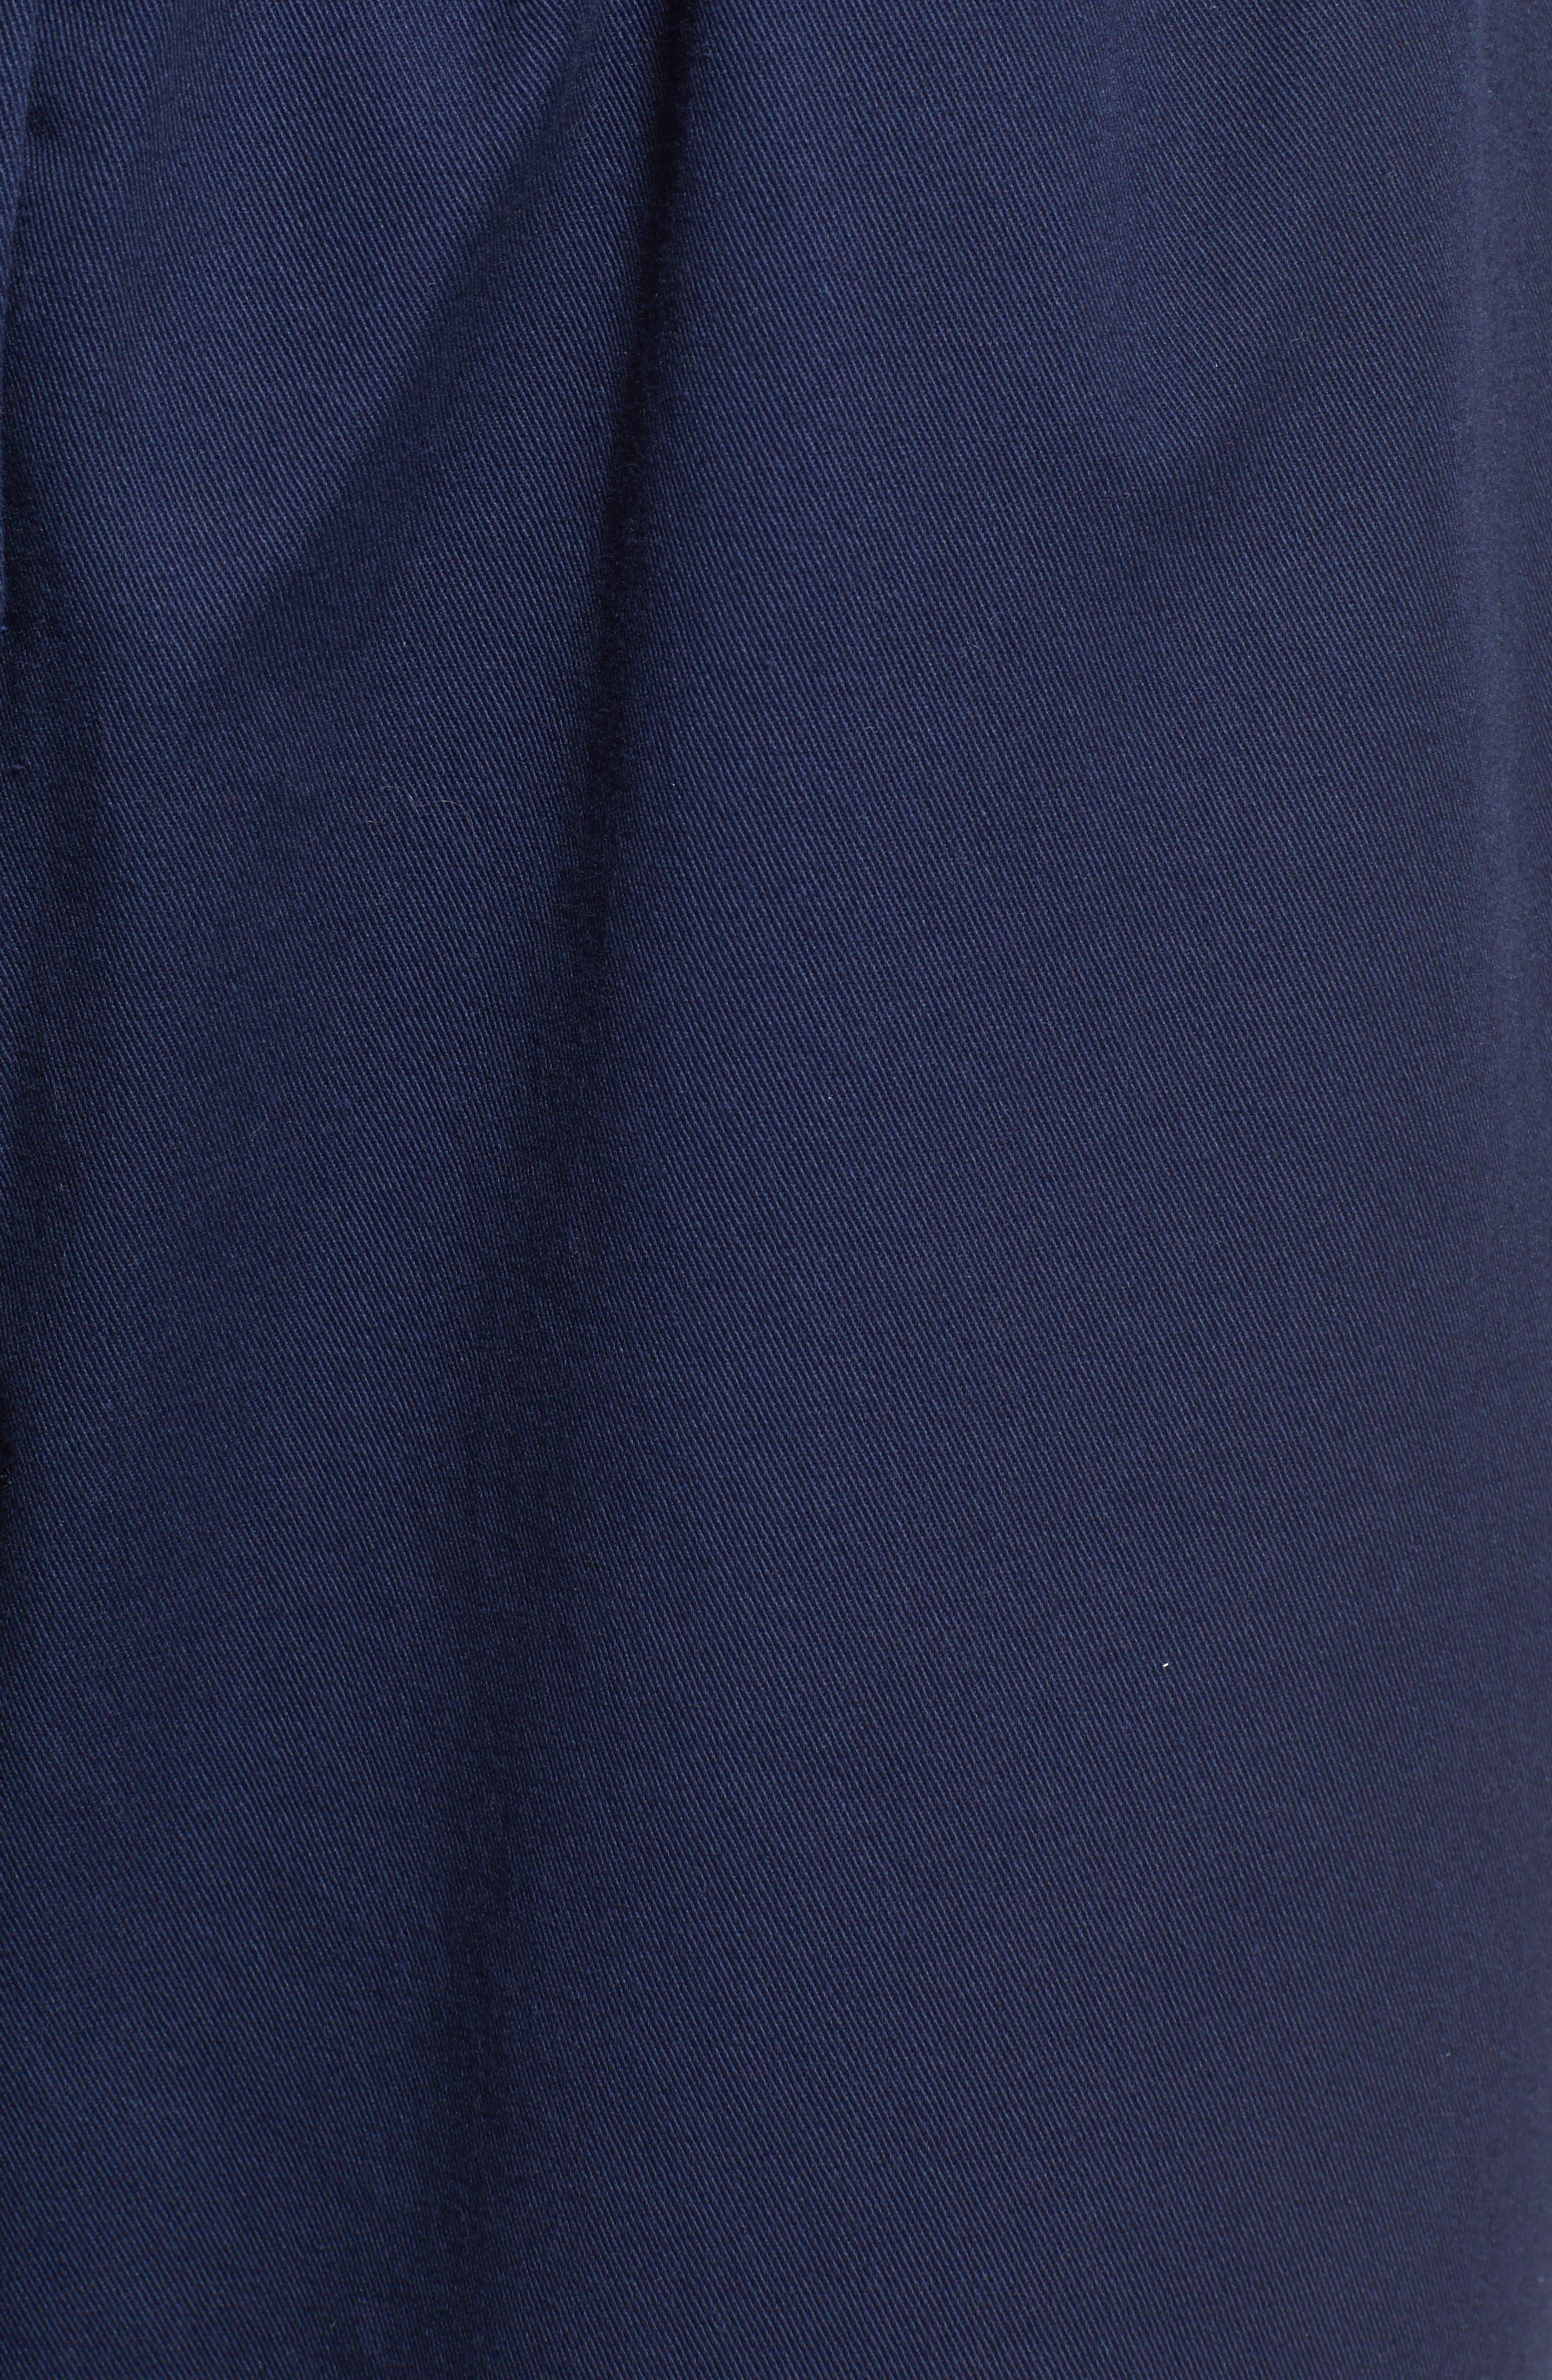 TEN SIXTY SHERMAN, Twill Workwear Jumpsuit, Alternate thumbnail 6, color, 400